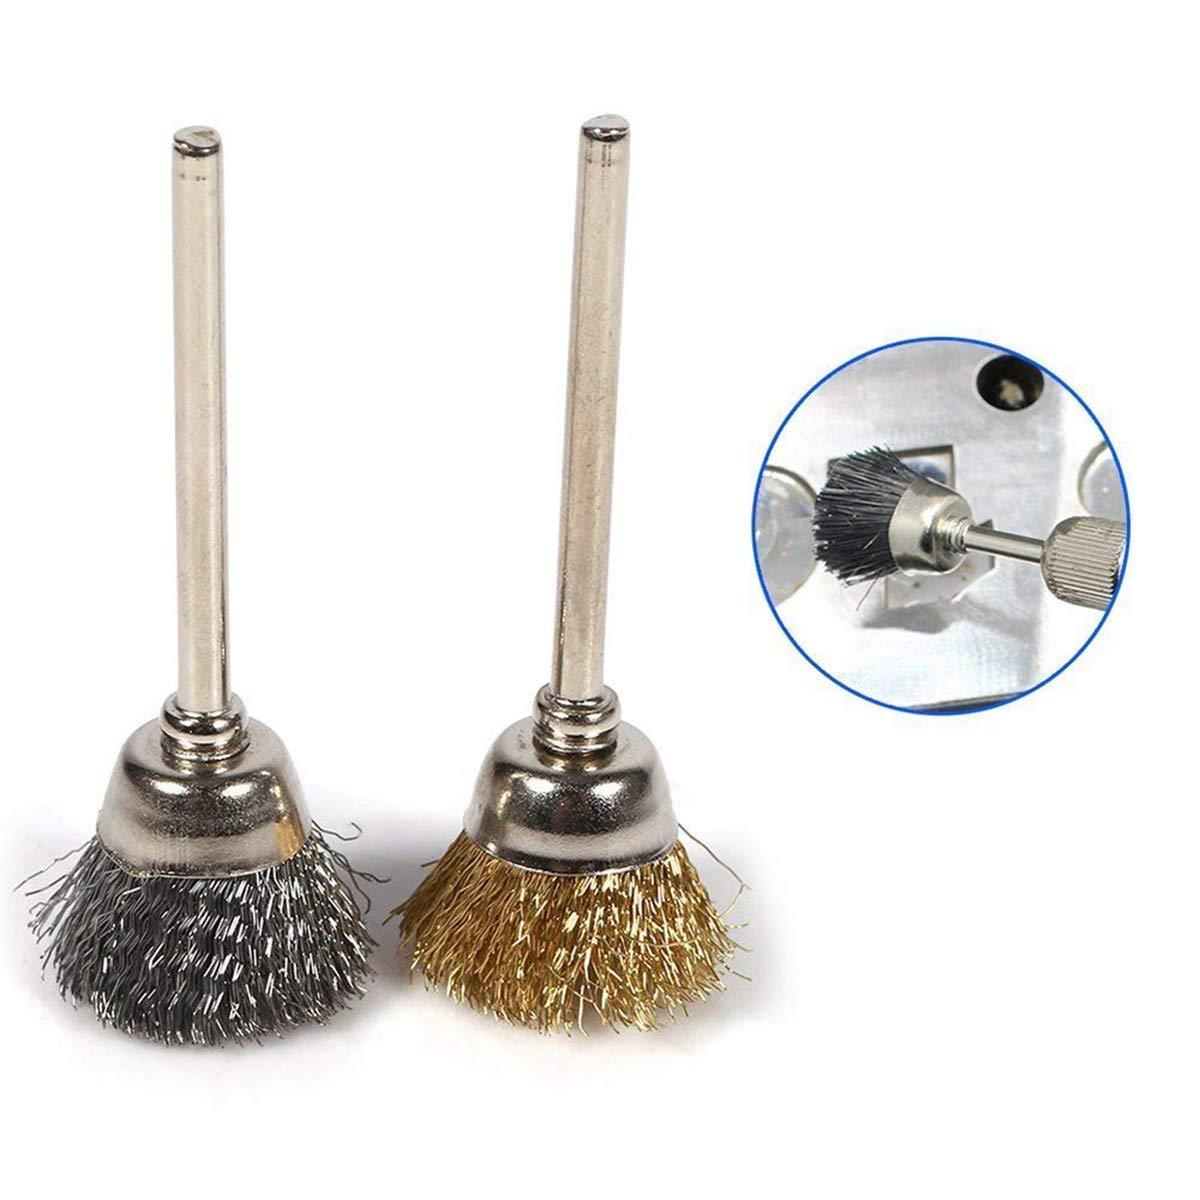 6mm Steel Wire Brush Polishing Wheels Full Kit for Dremel Rotary Tools US